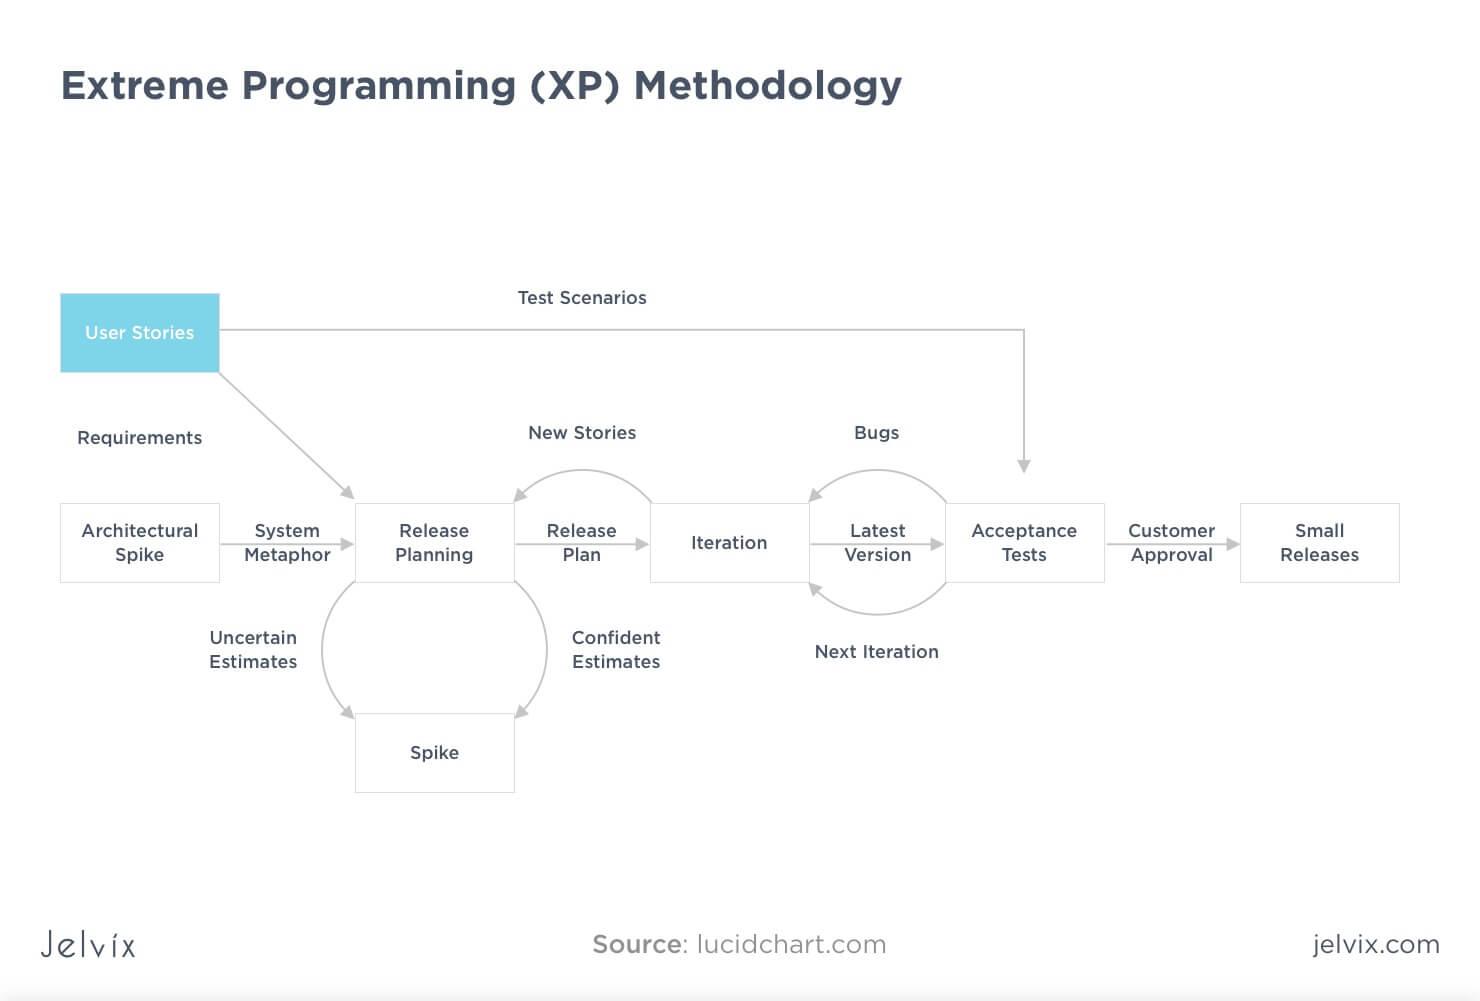 XP methodology